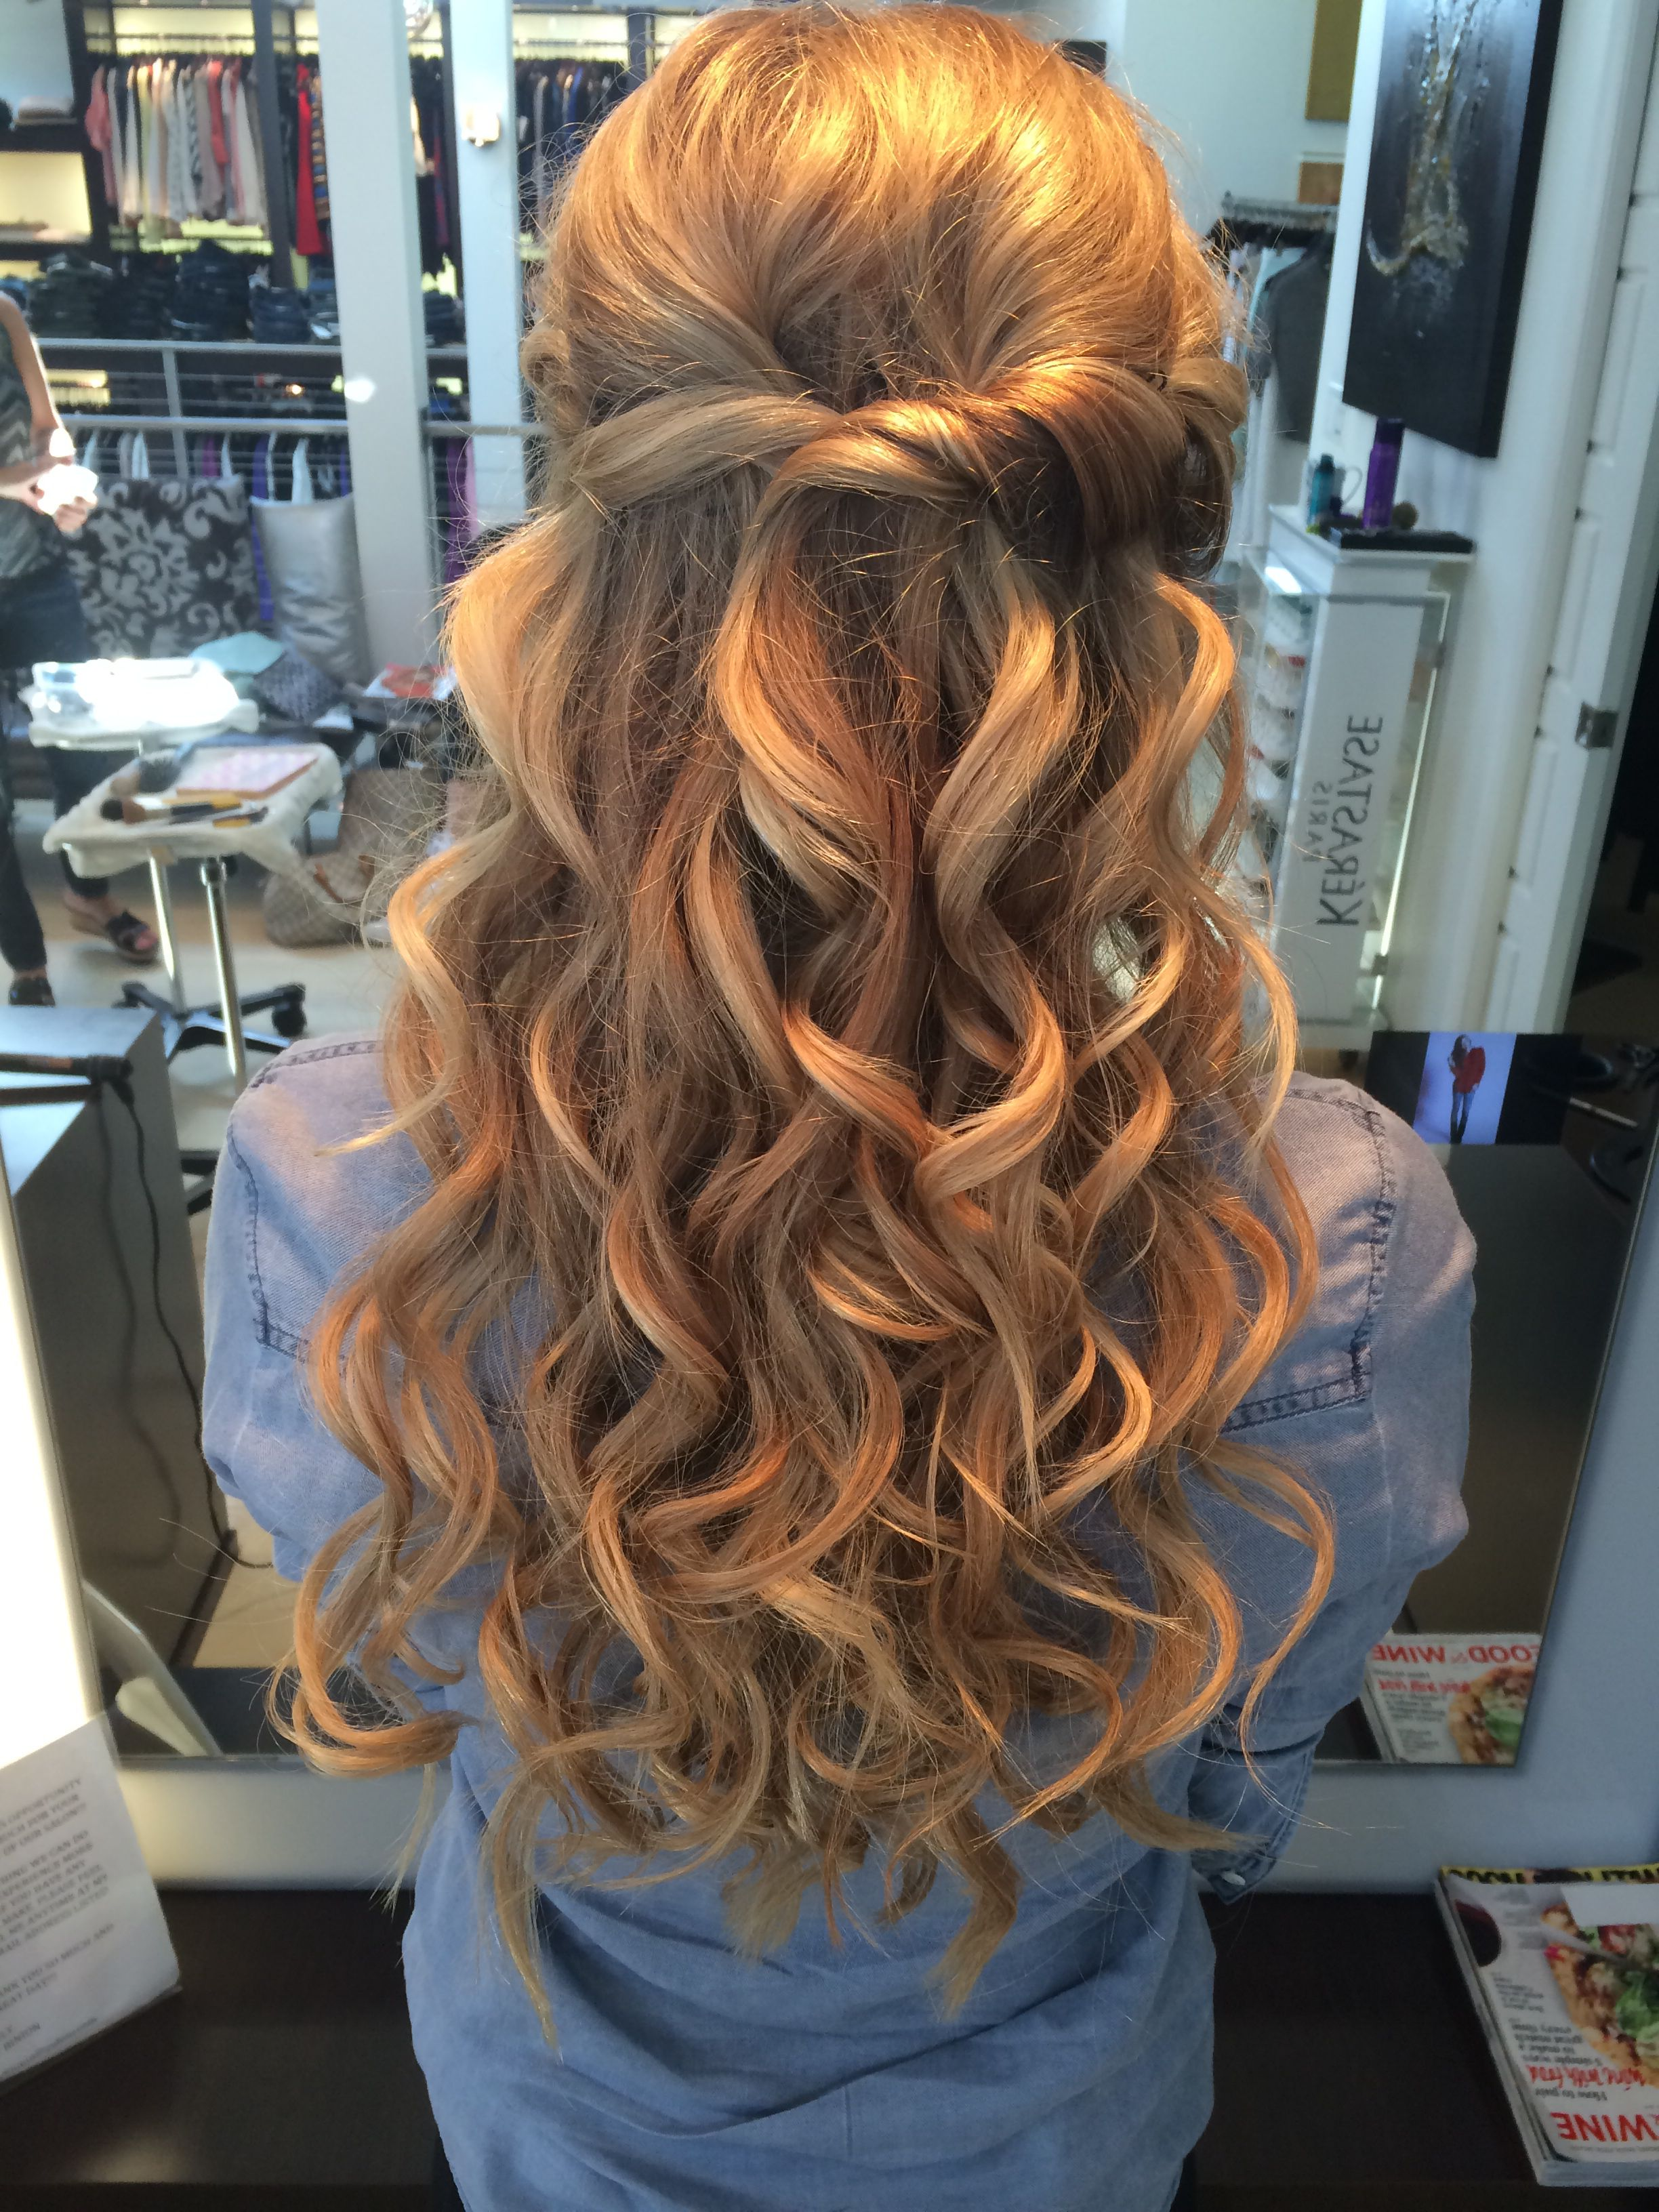 Prom half up half down hair